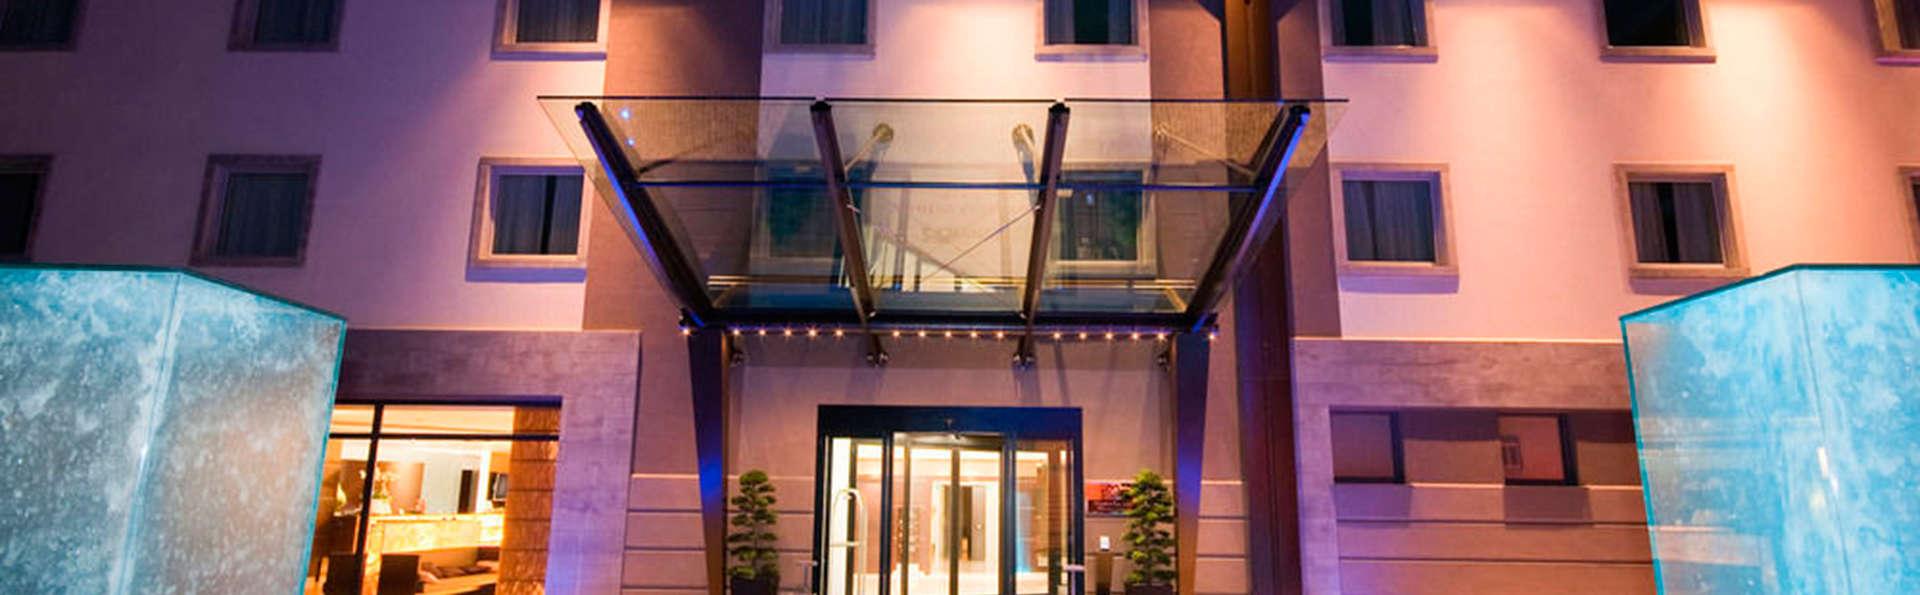 Winter Garden Hotel - EDIT_front1.jpg